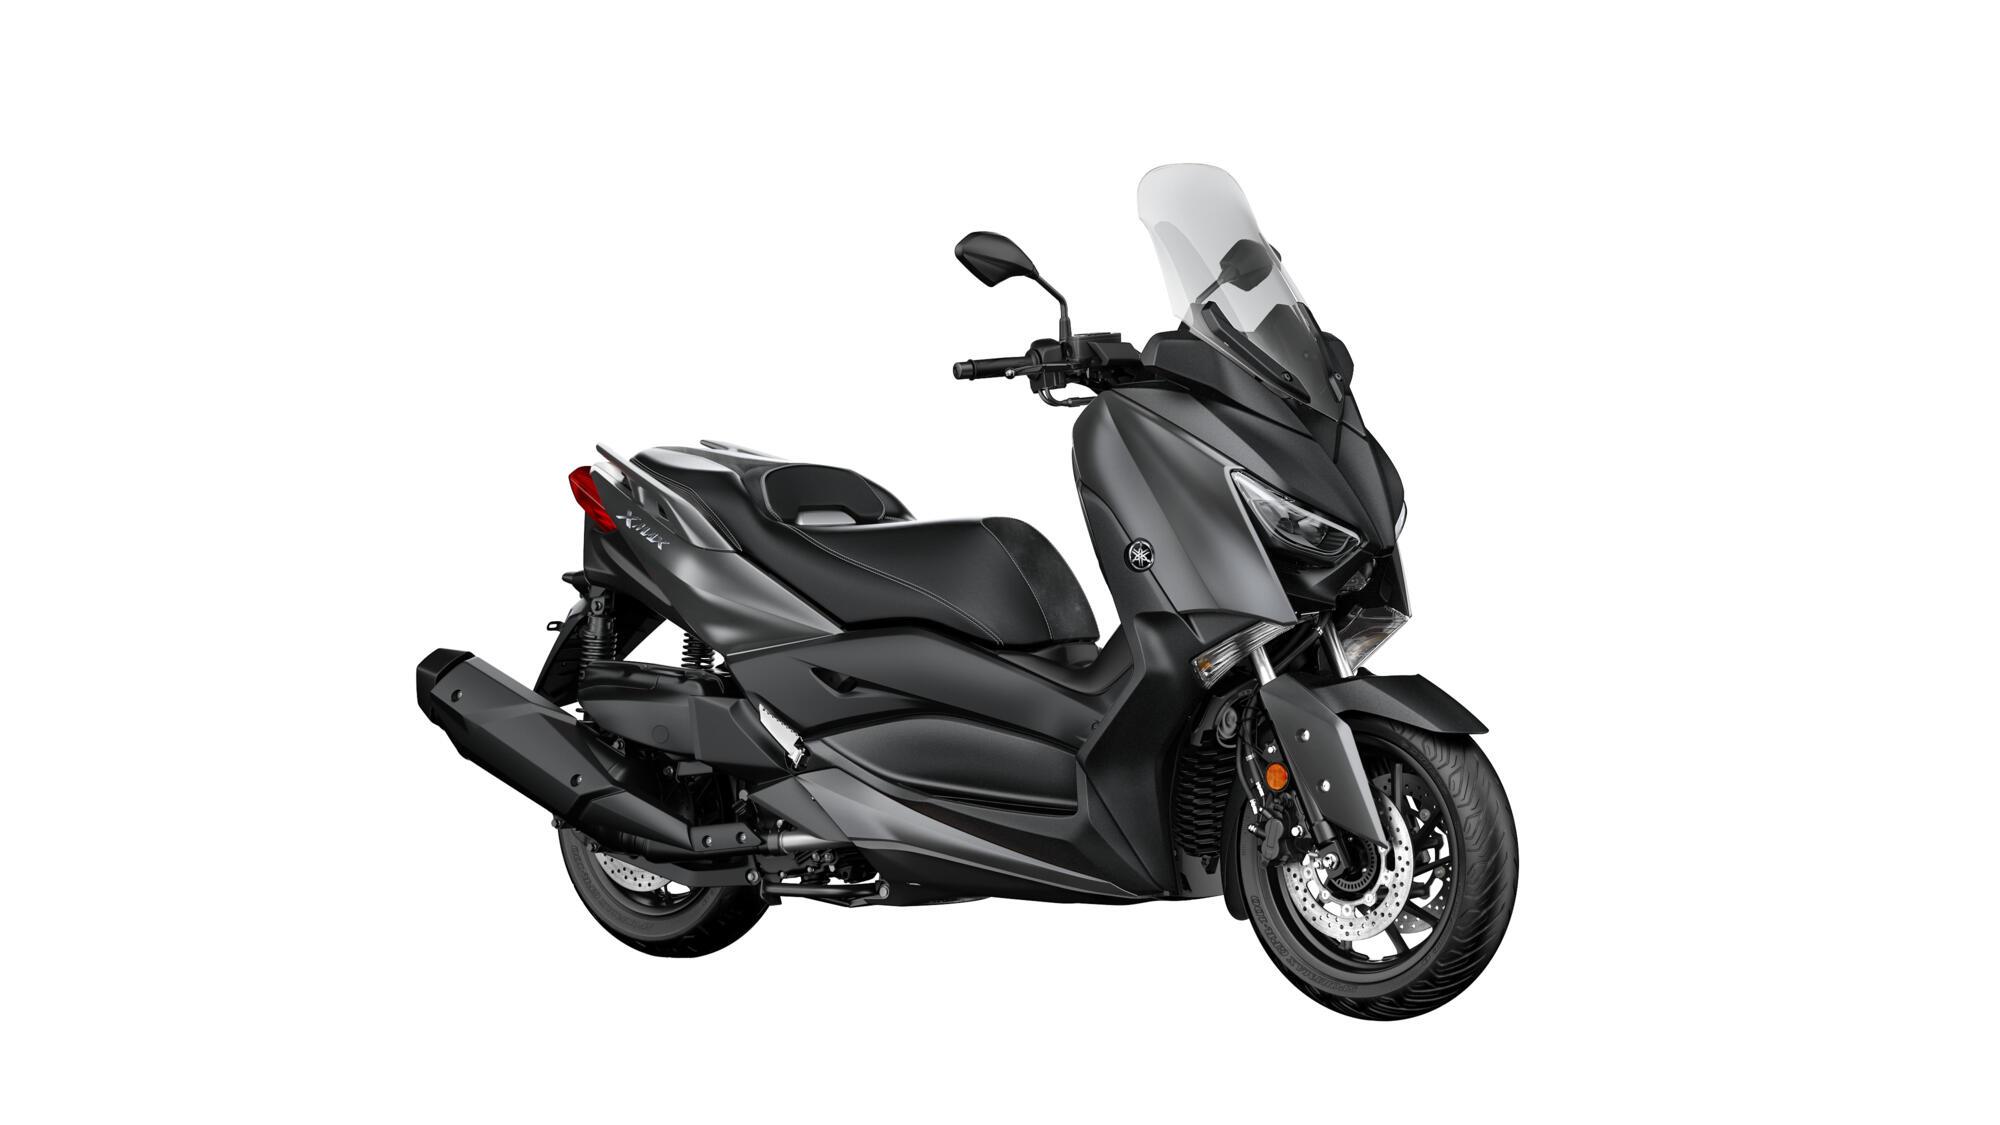 XMAX 400